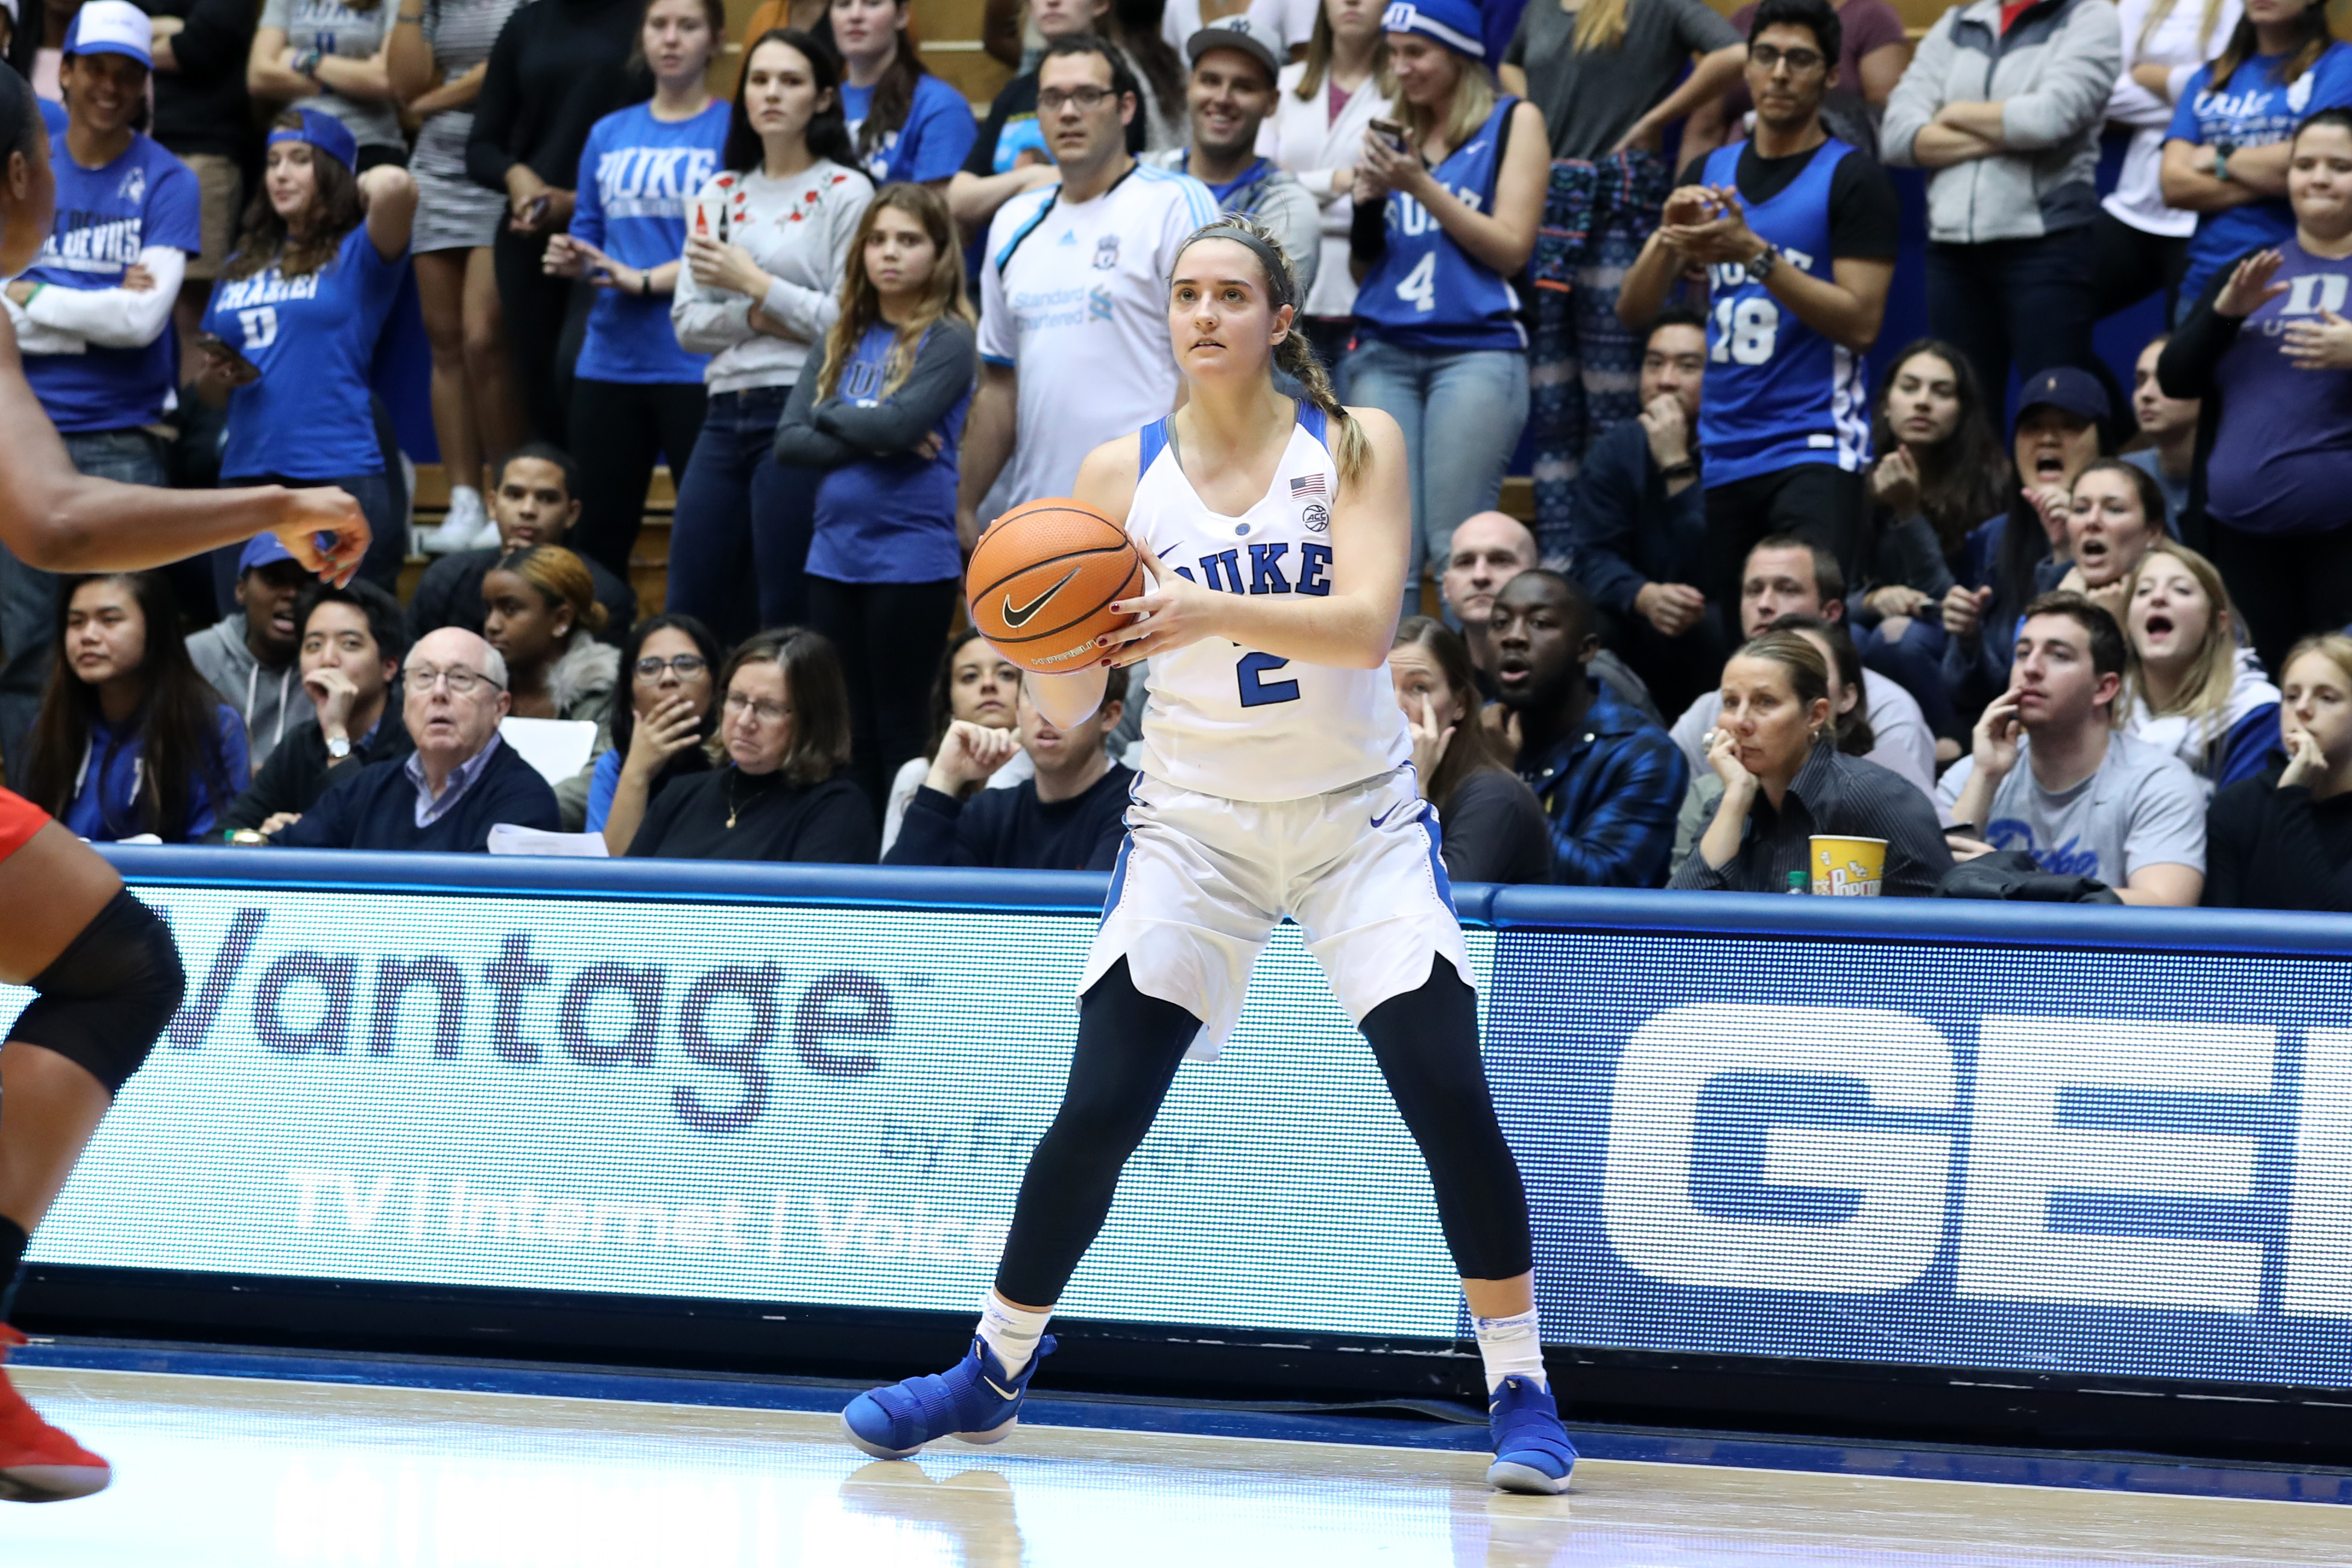 COLLEGE BASKETBALL: NOV 30 Women's - Ohio State at Duke